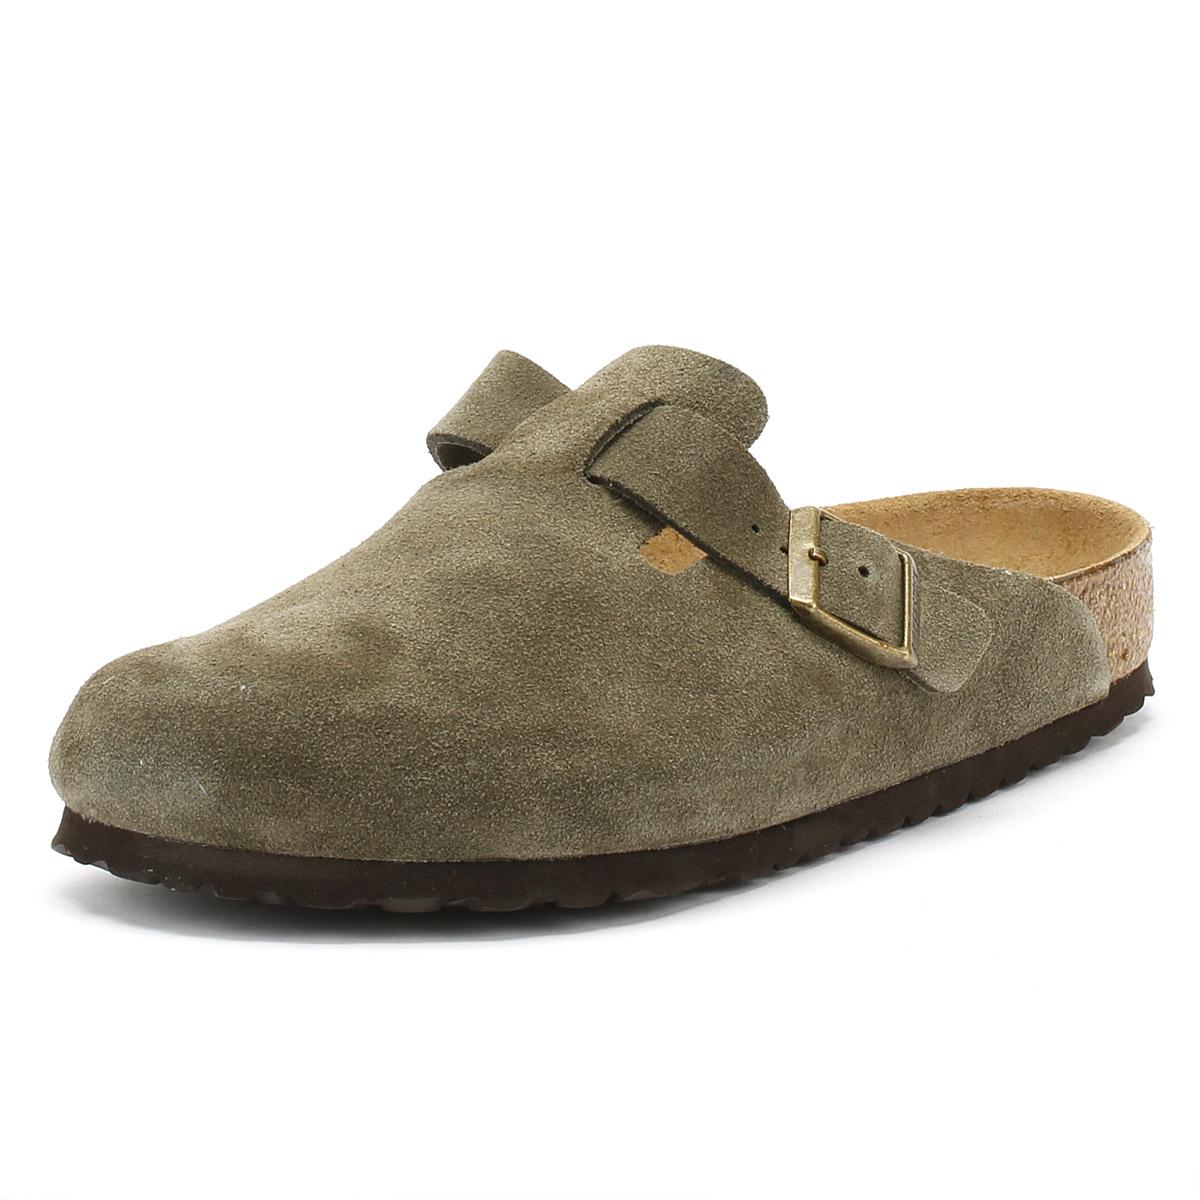 ee1fc90ea8 Details about Birkenstock Green Forest Boston Suede Clogs Unisex Sandals  Summer Shoes